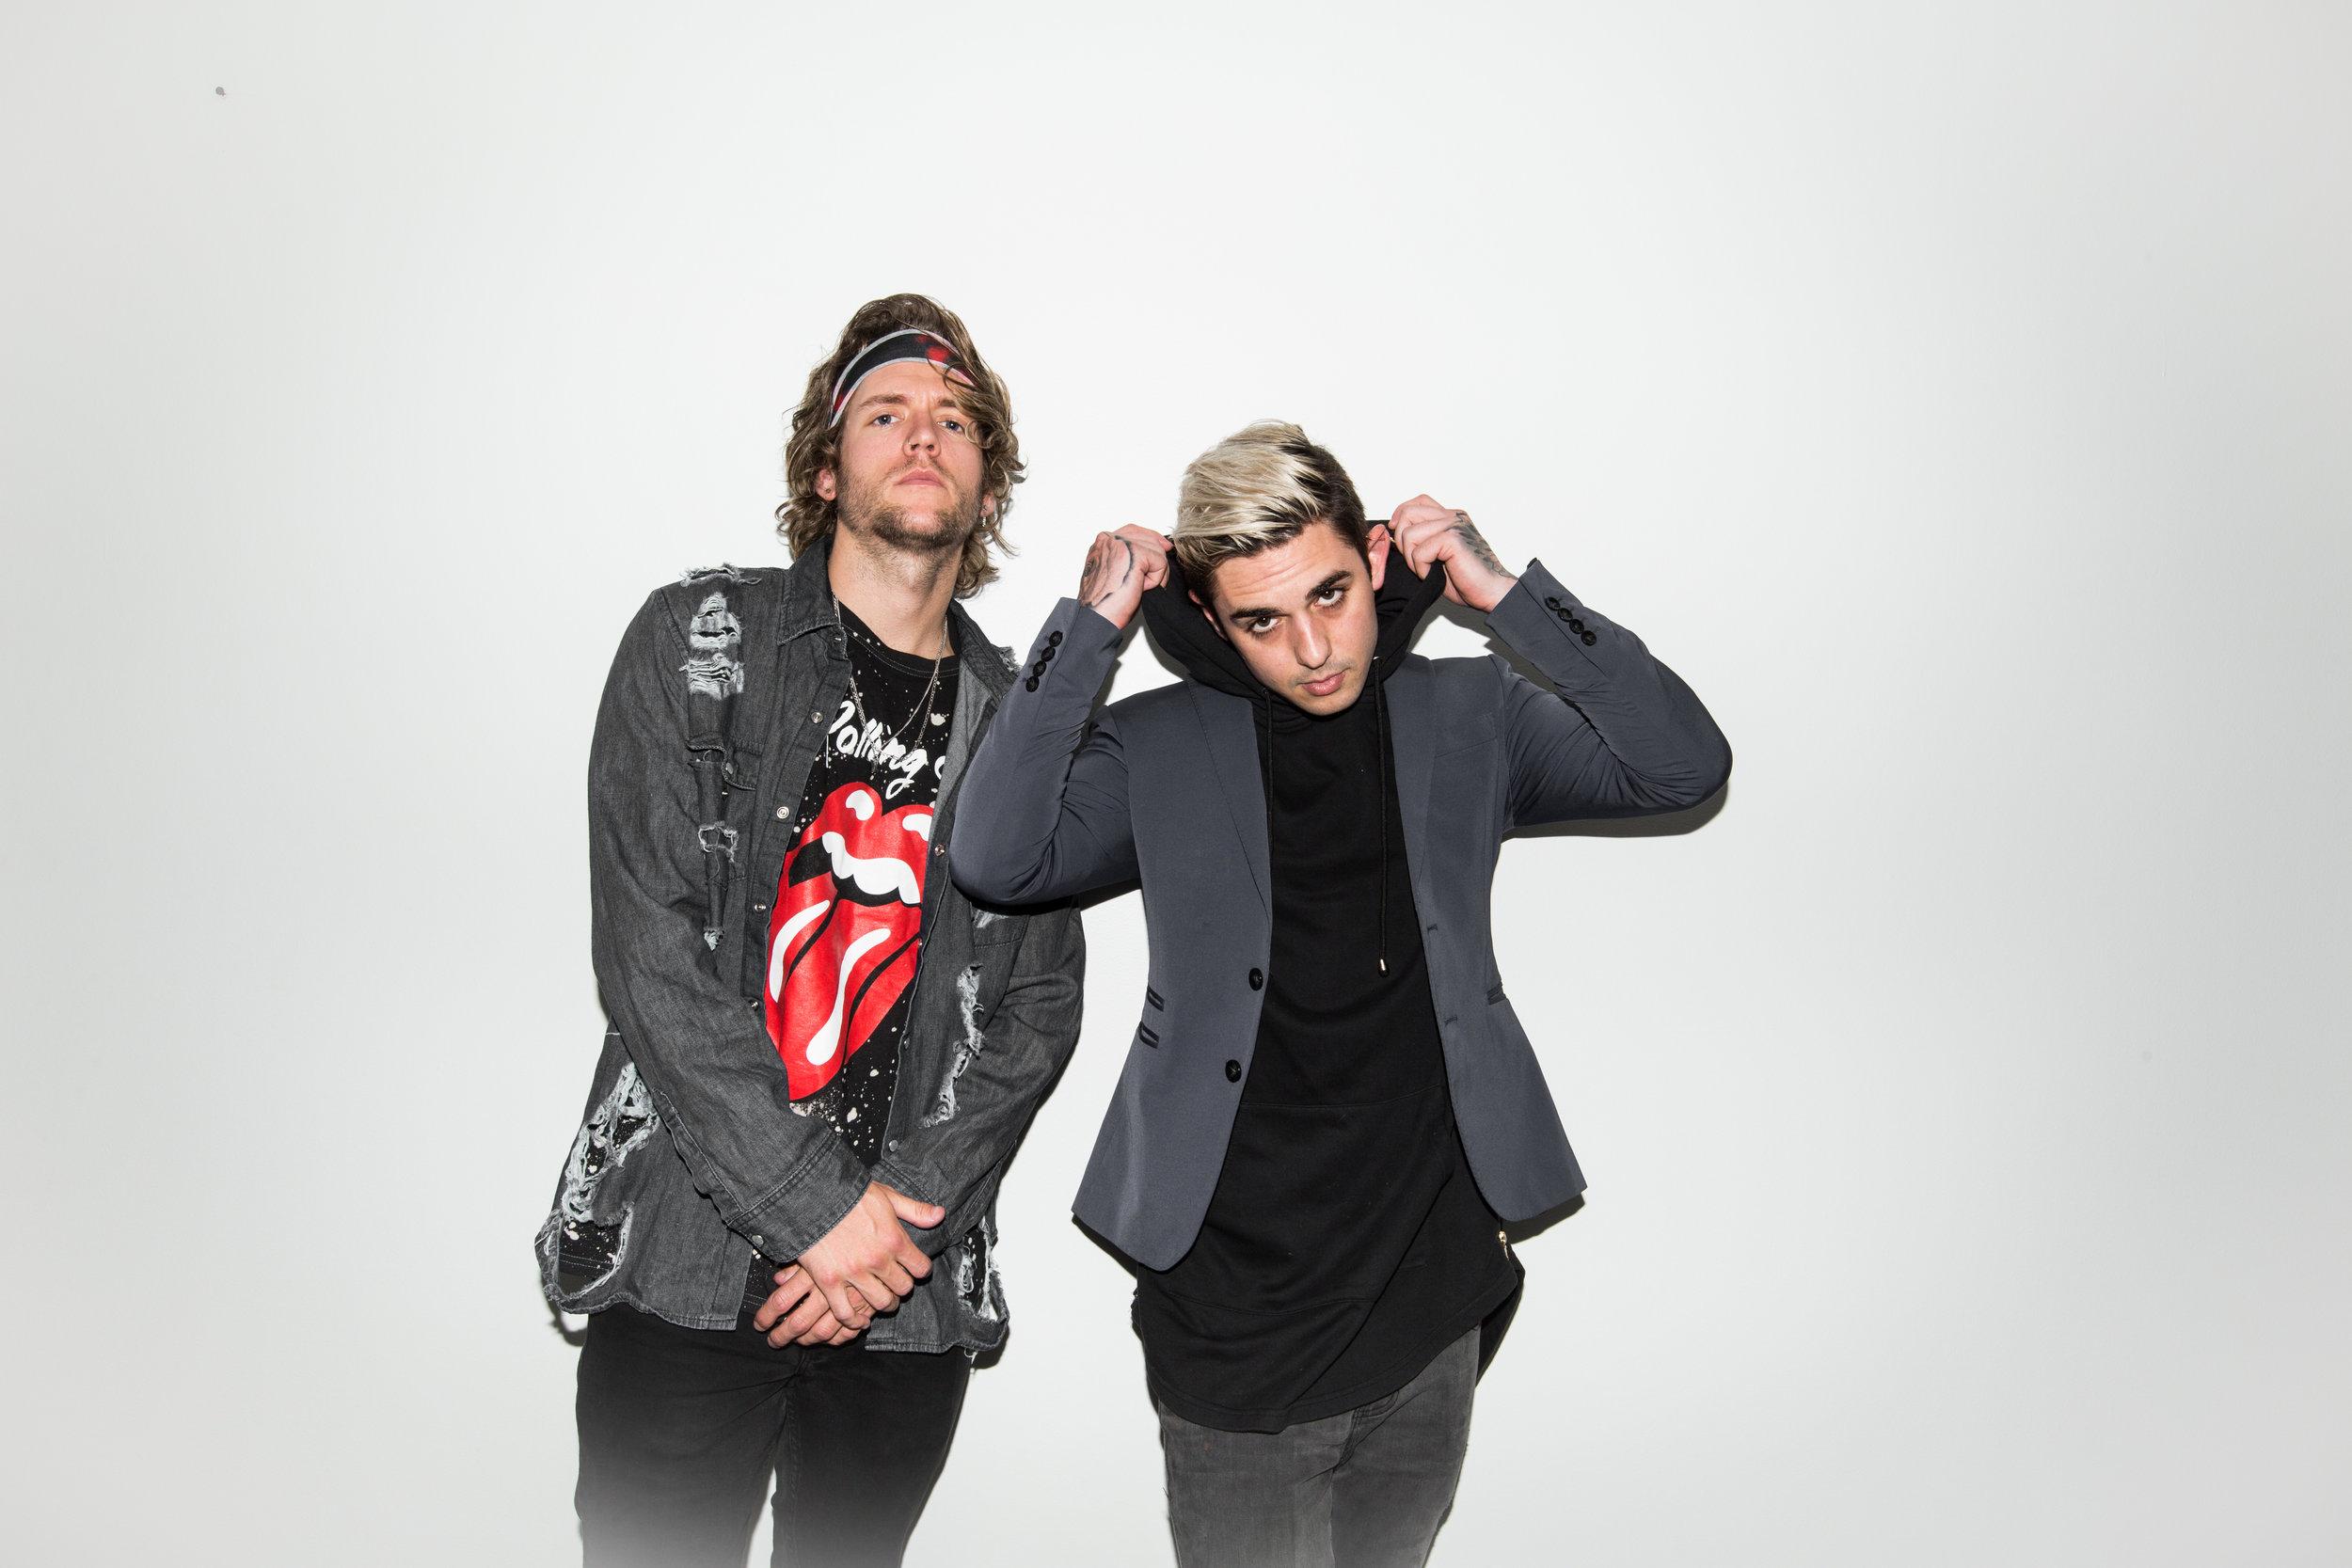 Neffex Drops Alt-Pop Anthem 'It's My Life' ile ilgili görsel sonucu